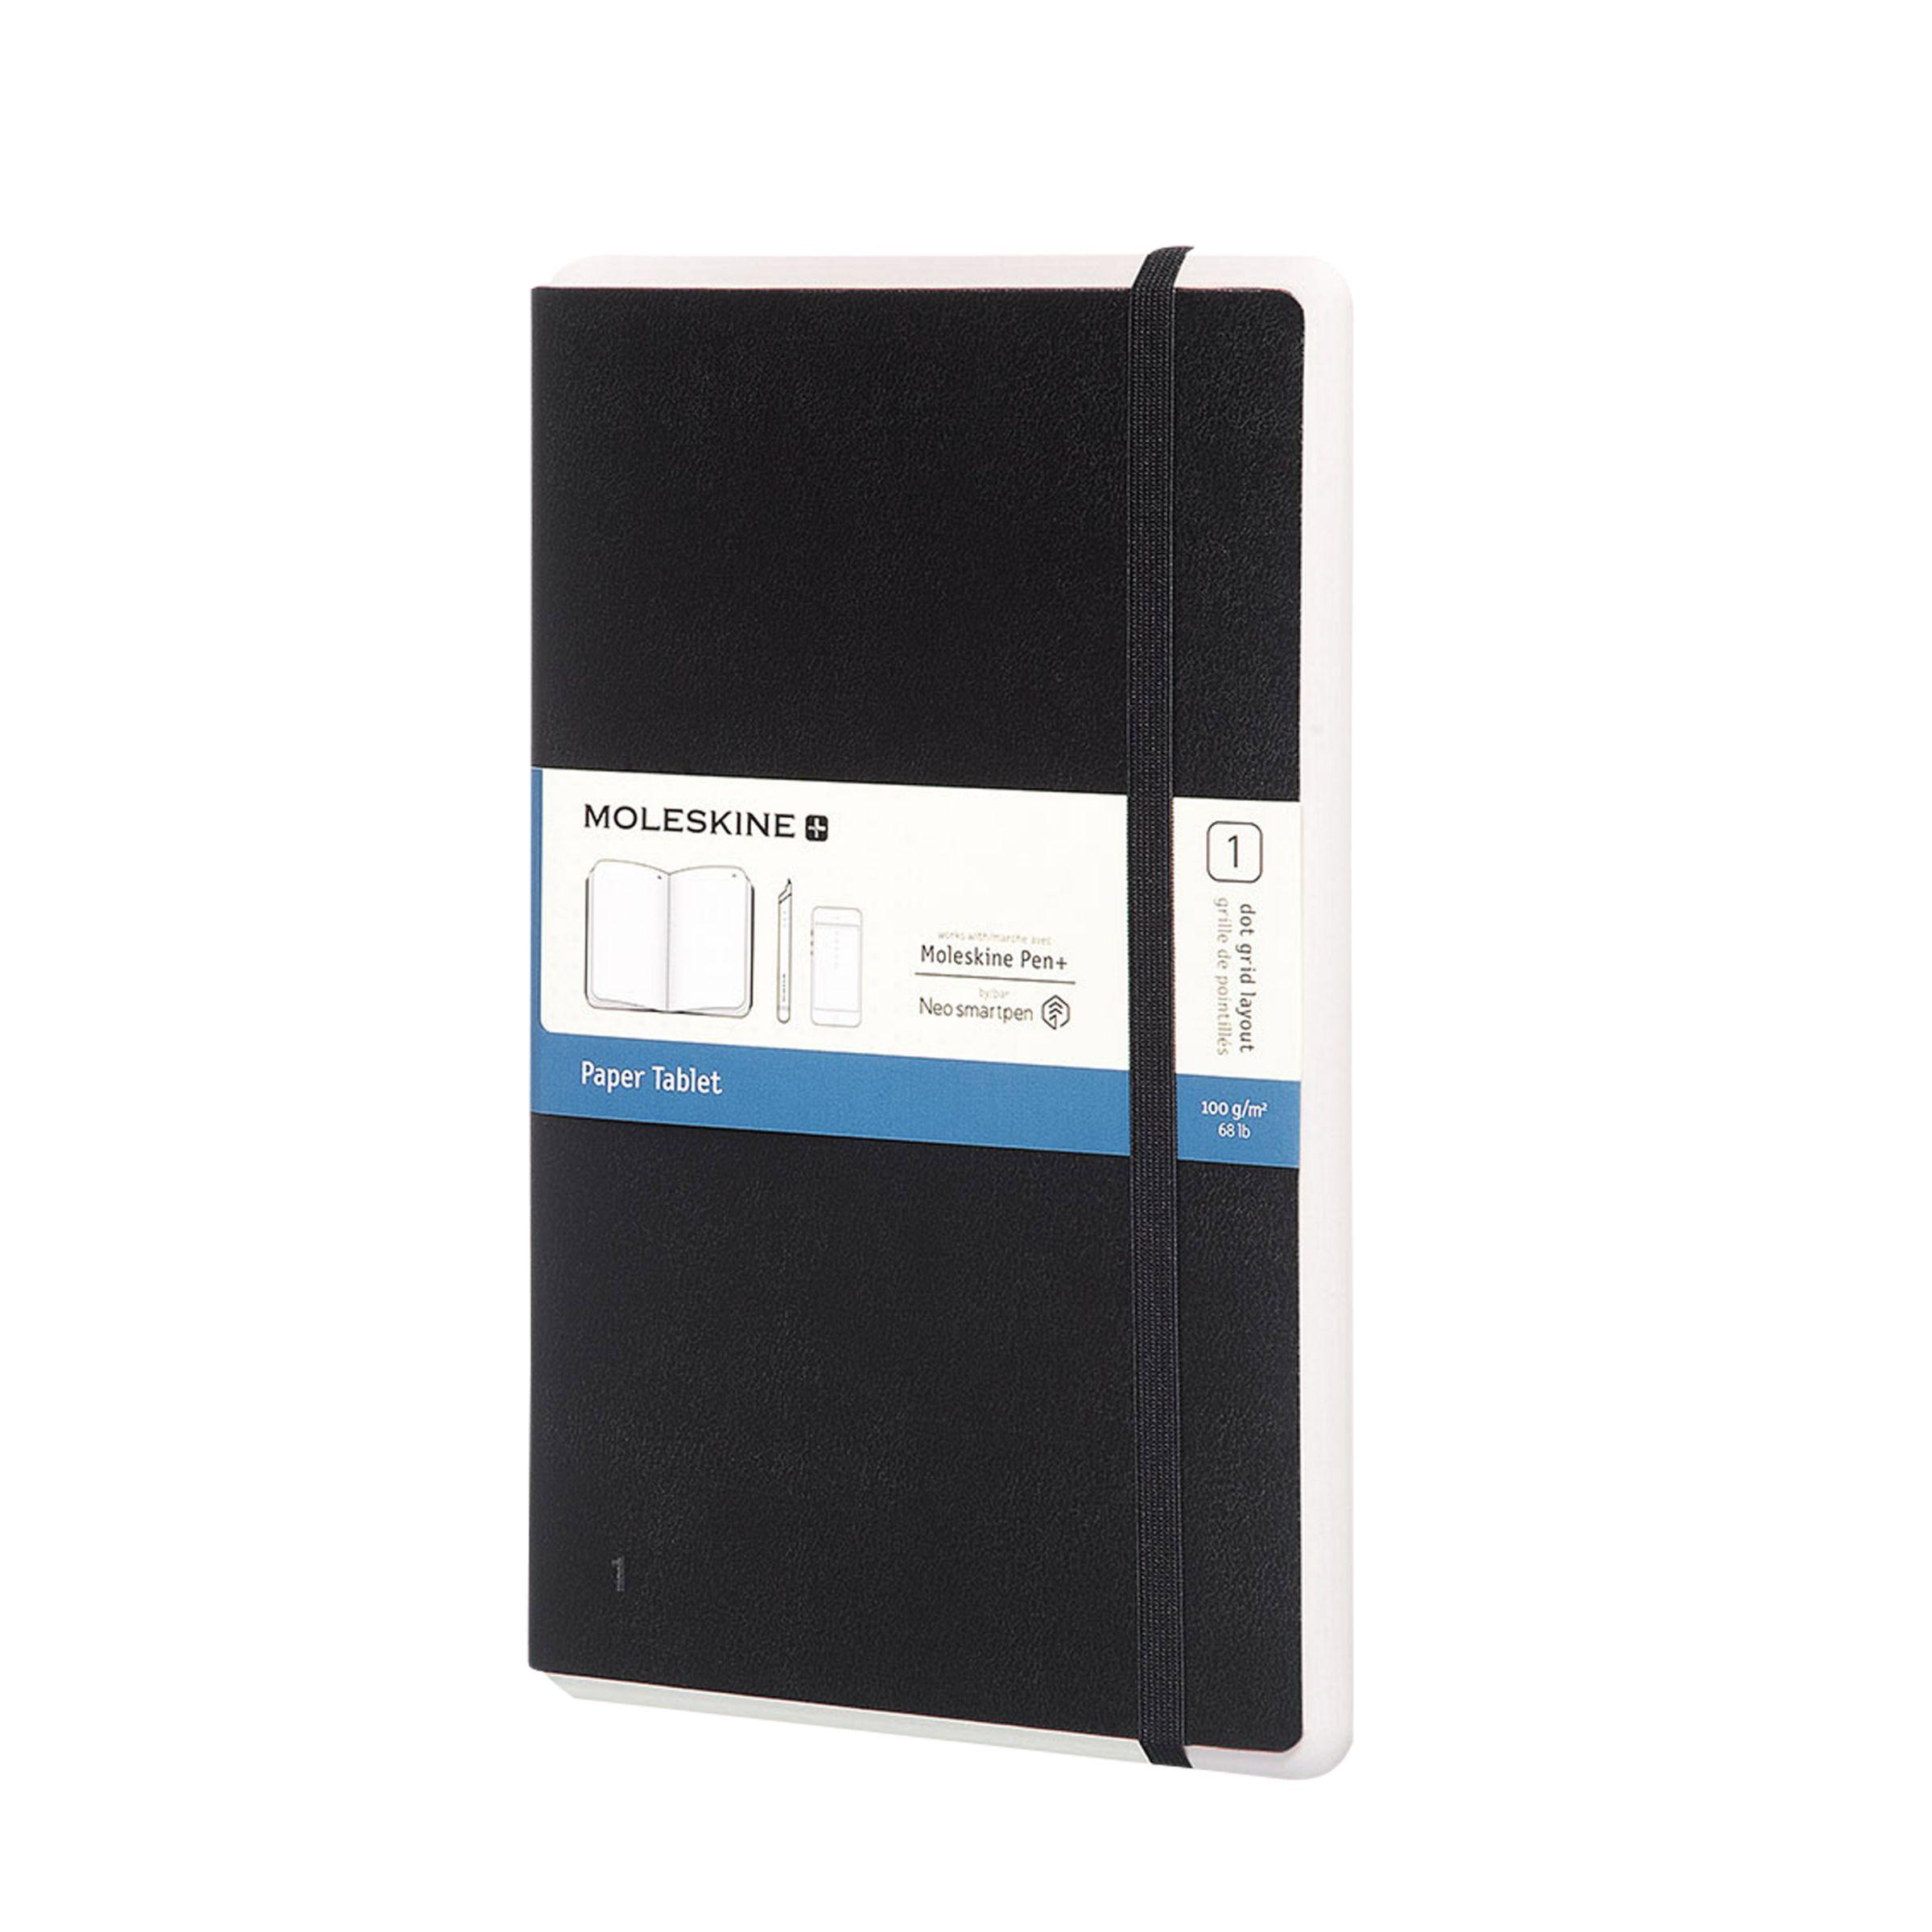 Moleskine Moleskine Paper Tablet Refill, Black